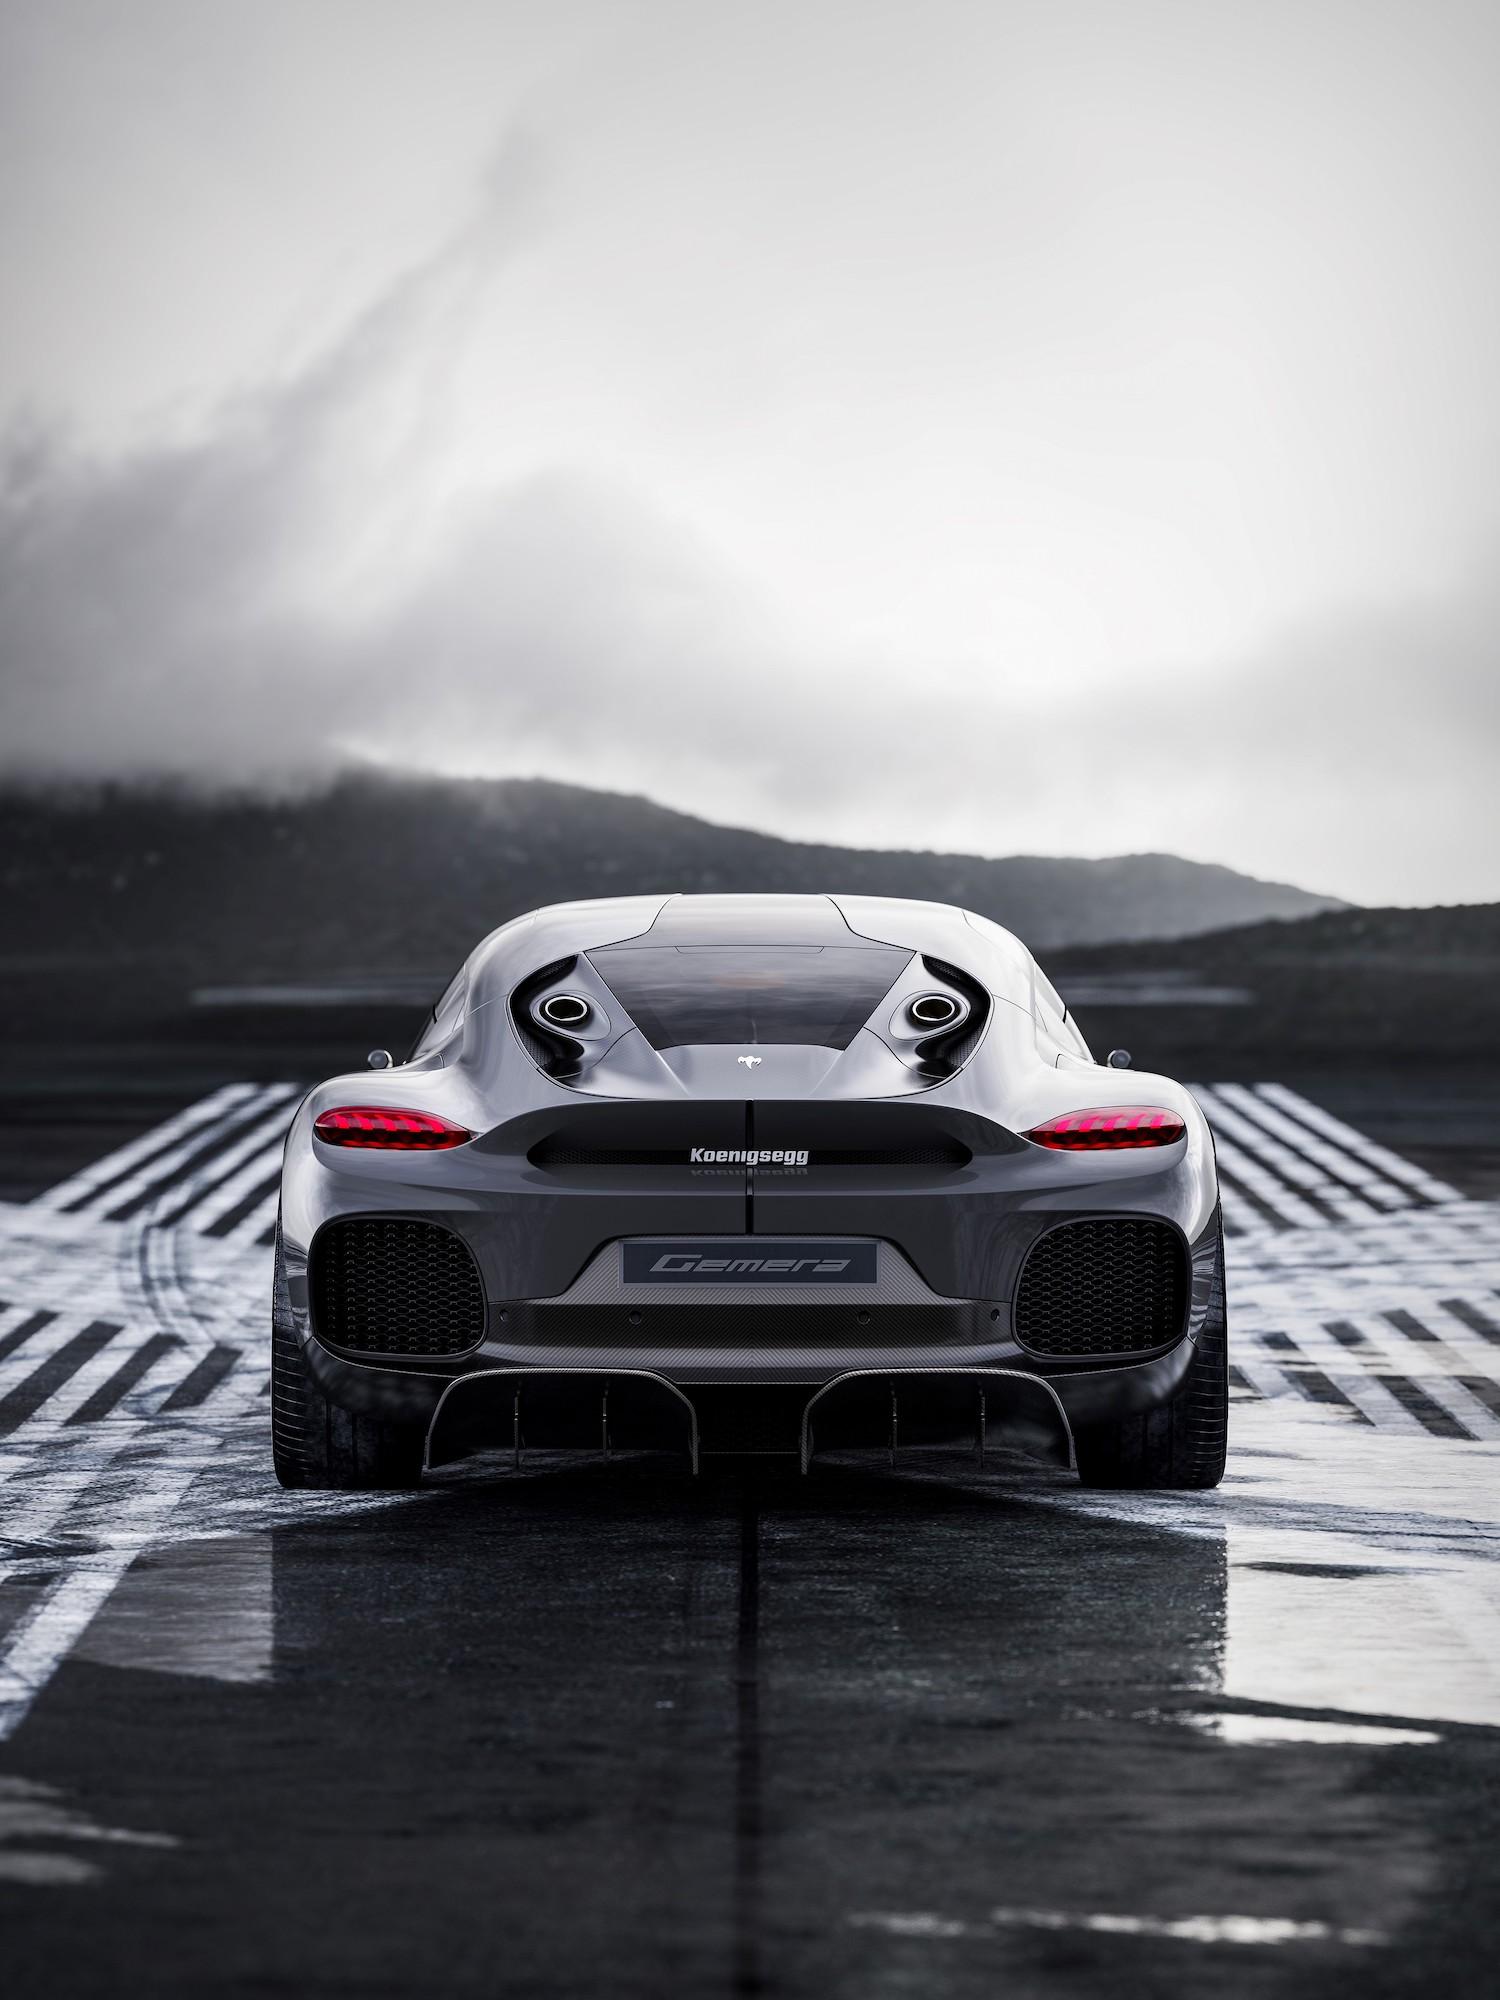 Koenigsegg gemera rear exhaust